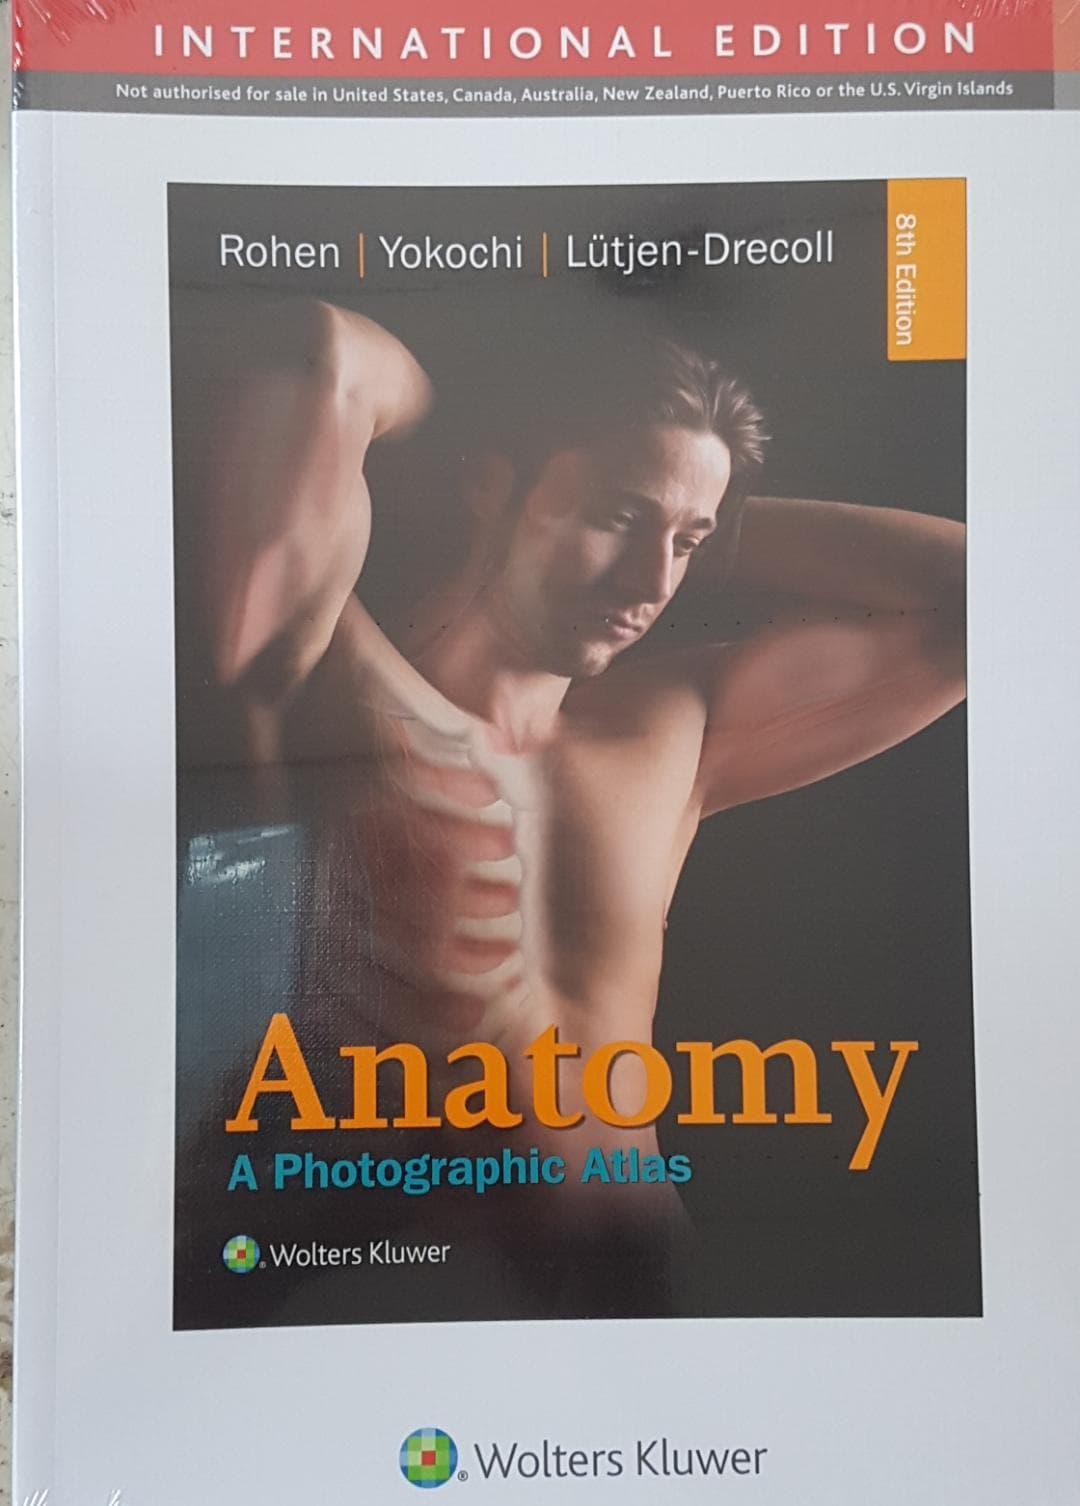 [ORIGINAL] Rohen Yokochi Anatomi : A Photographic Atlas 8e